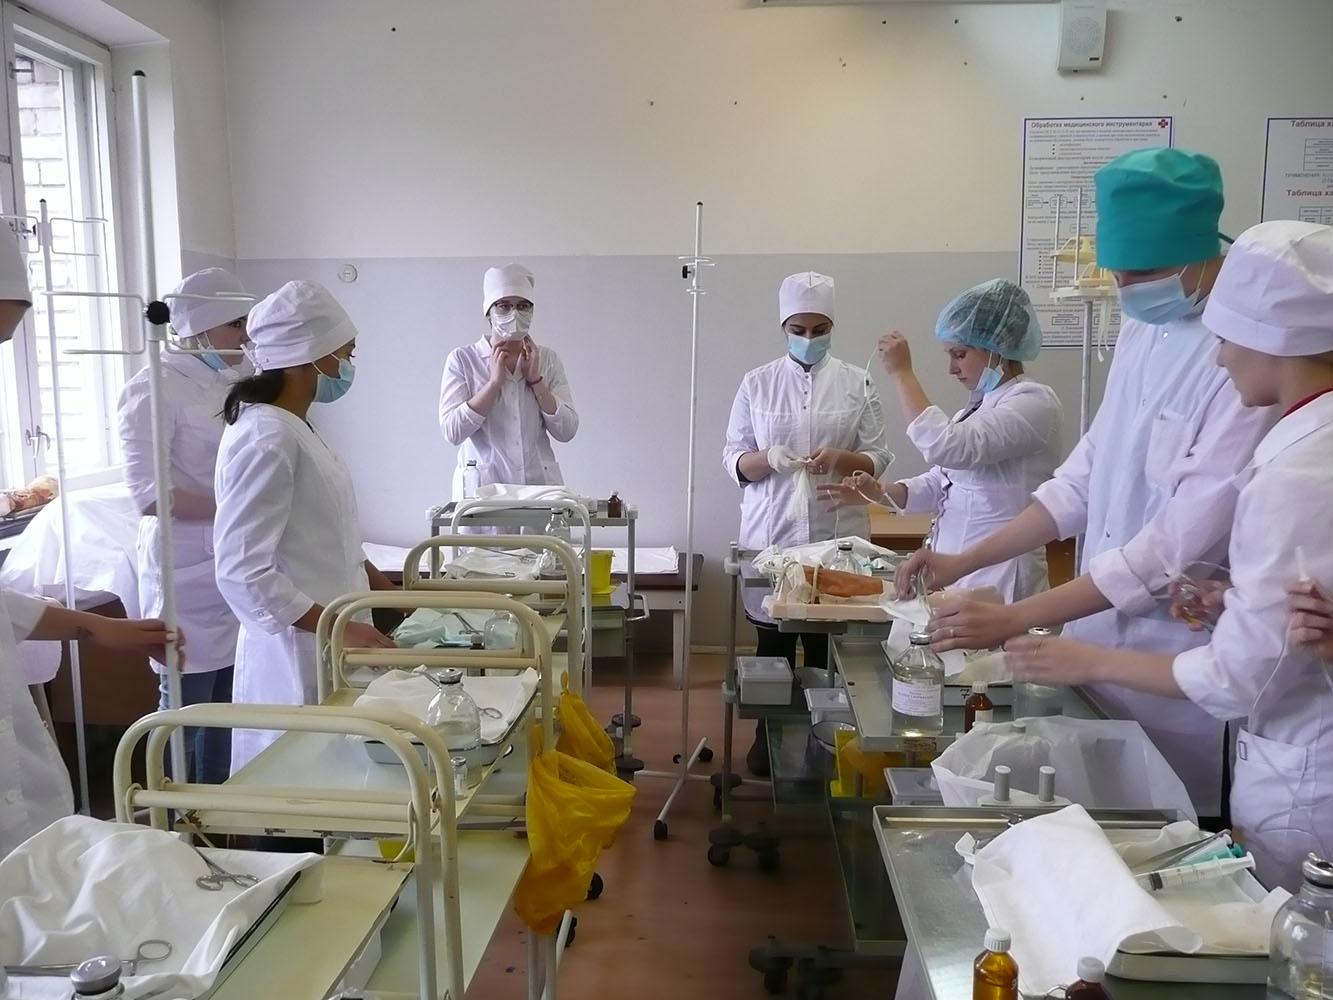 практика в медицинском колледже